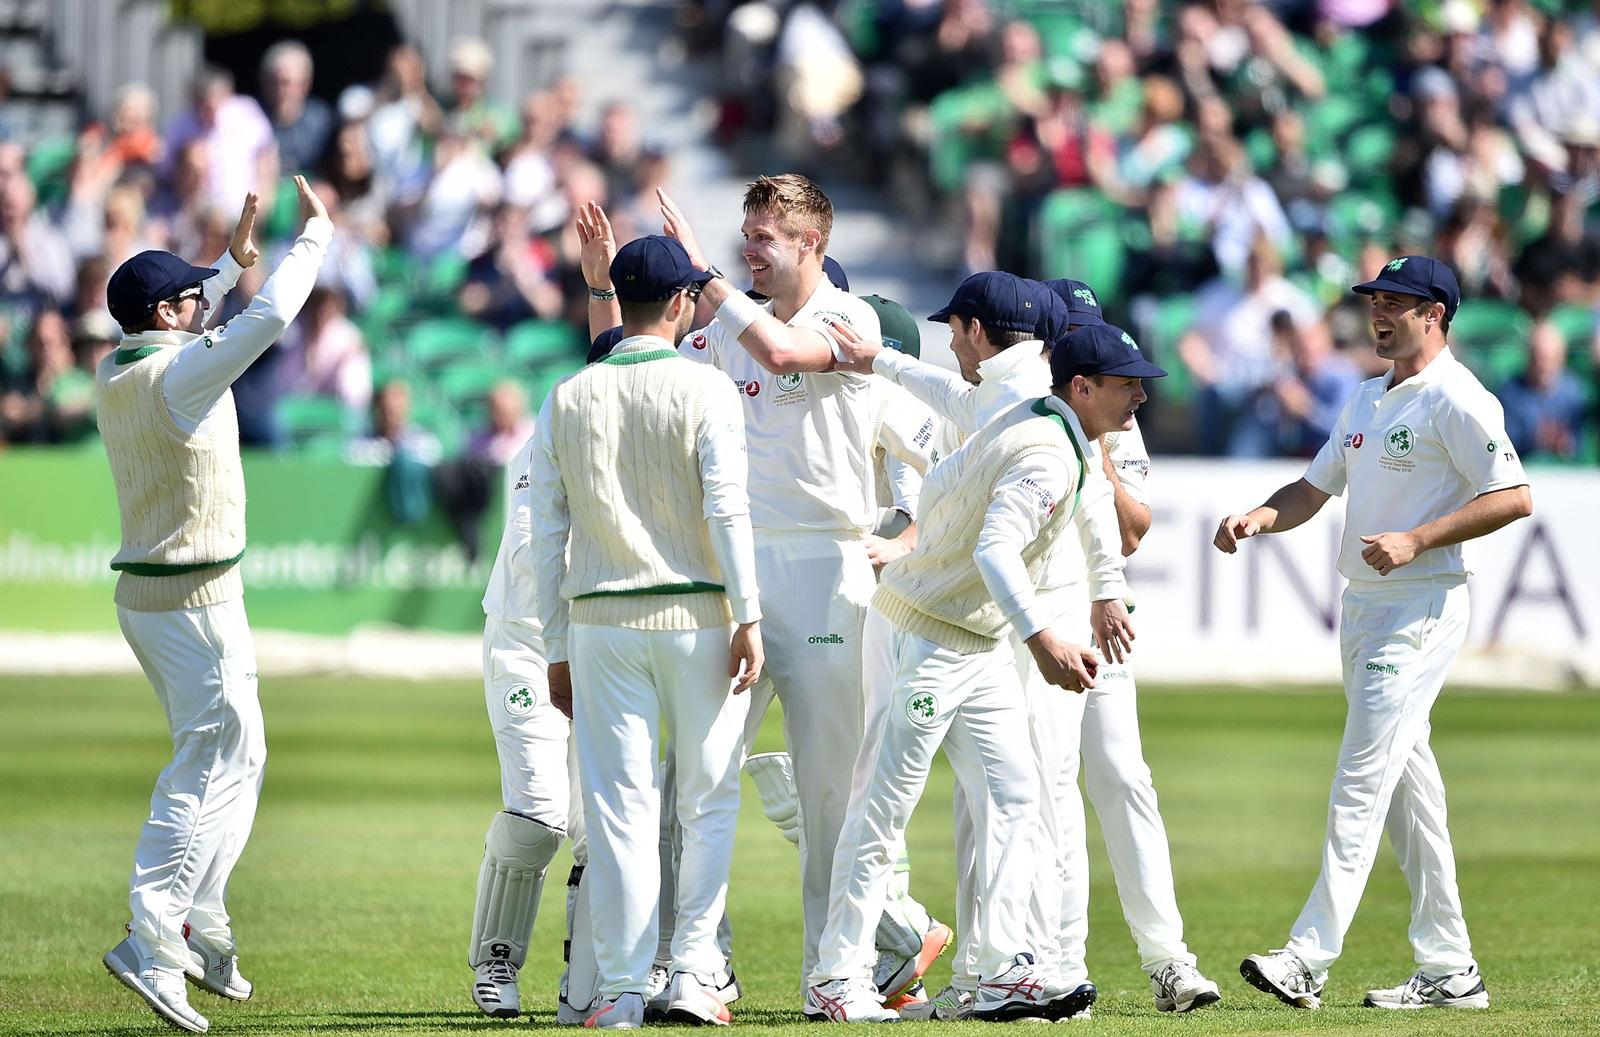 Image result for ireland test cricket